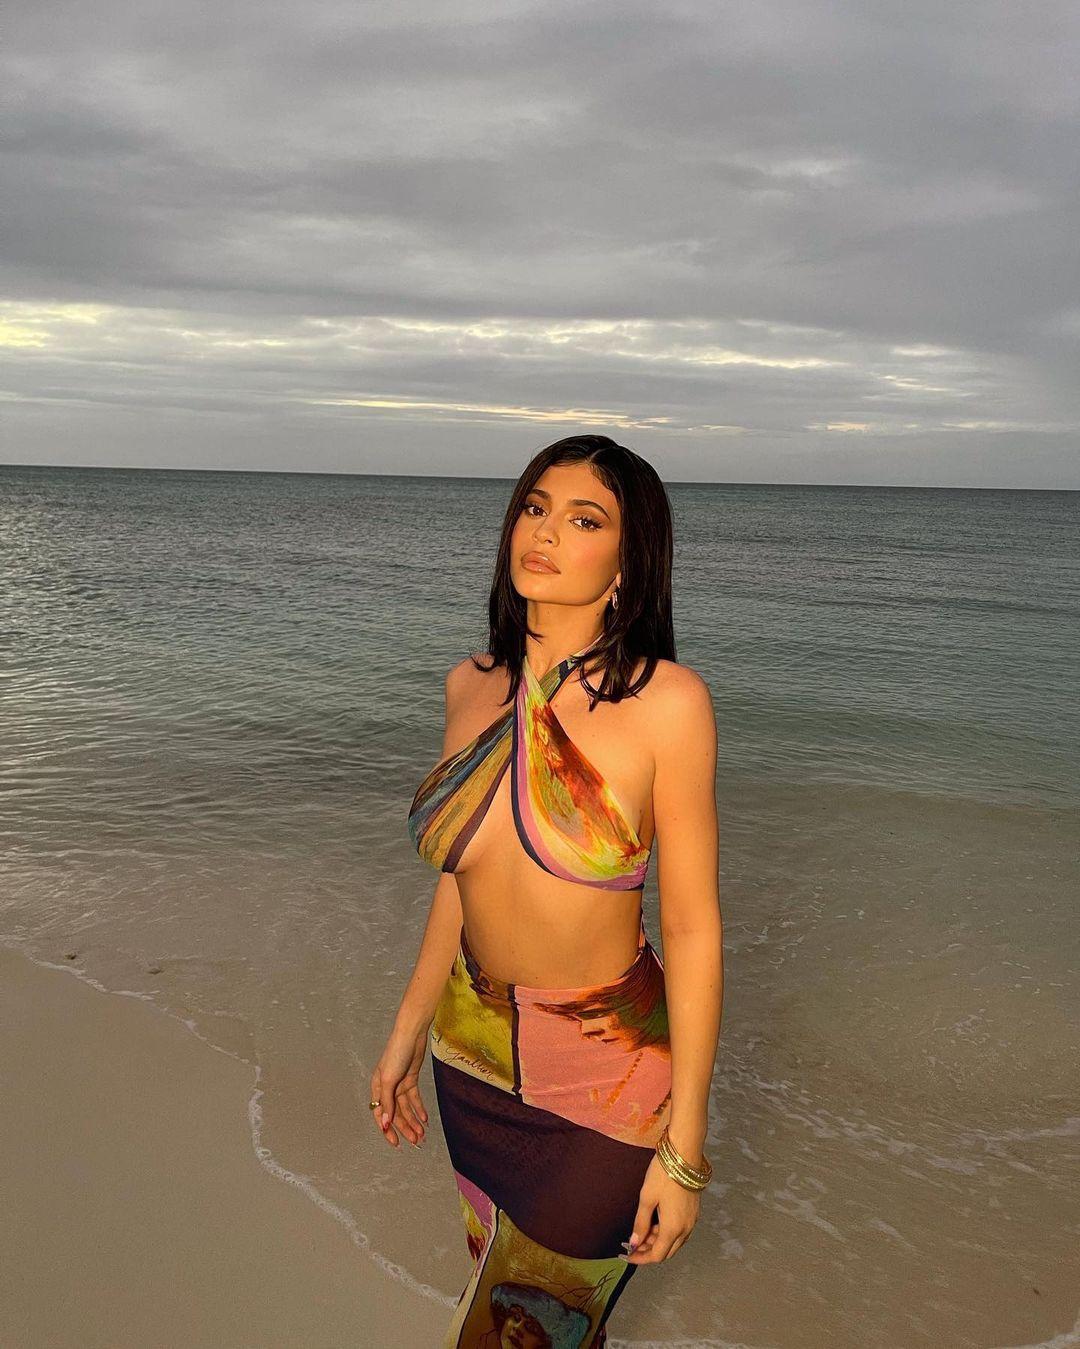 Kylie Jenner Sexy On Beach